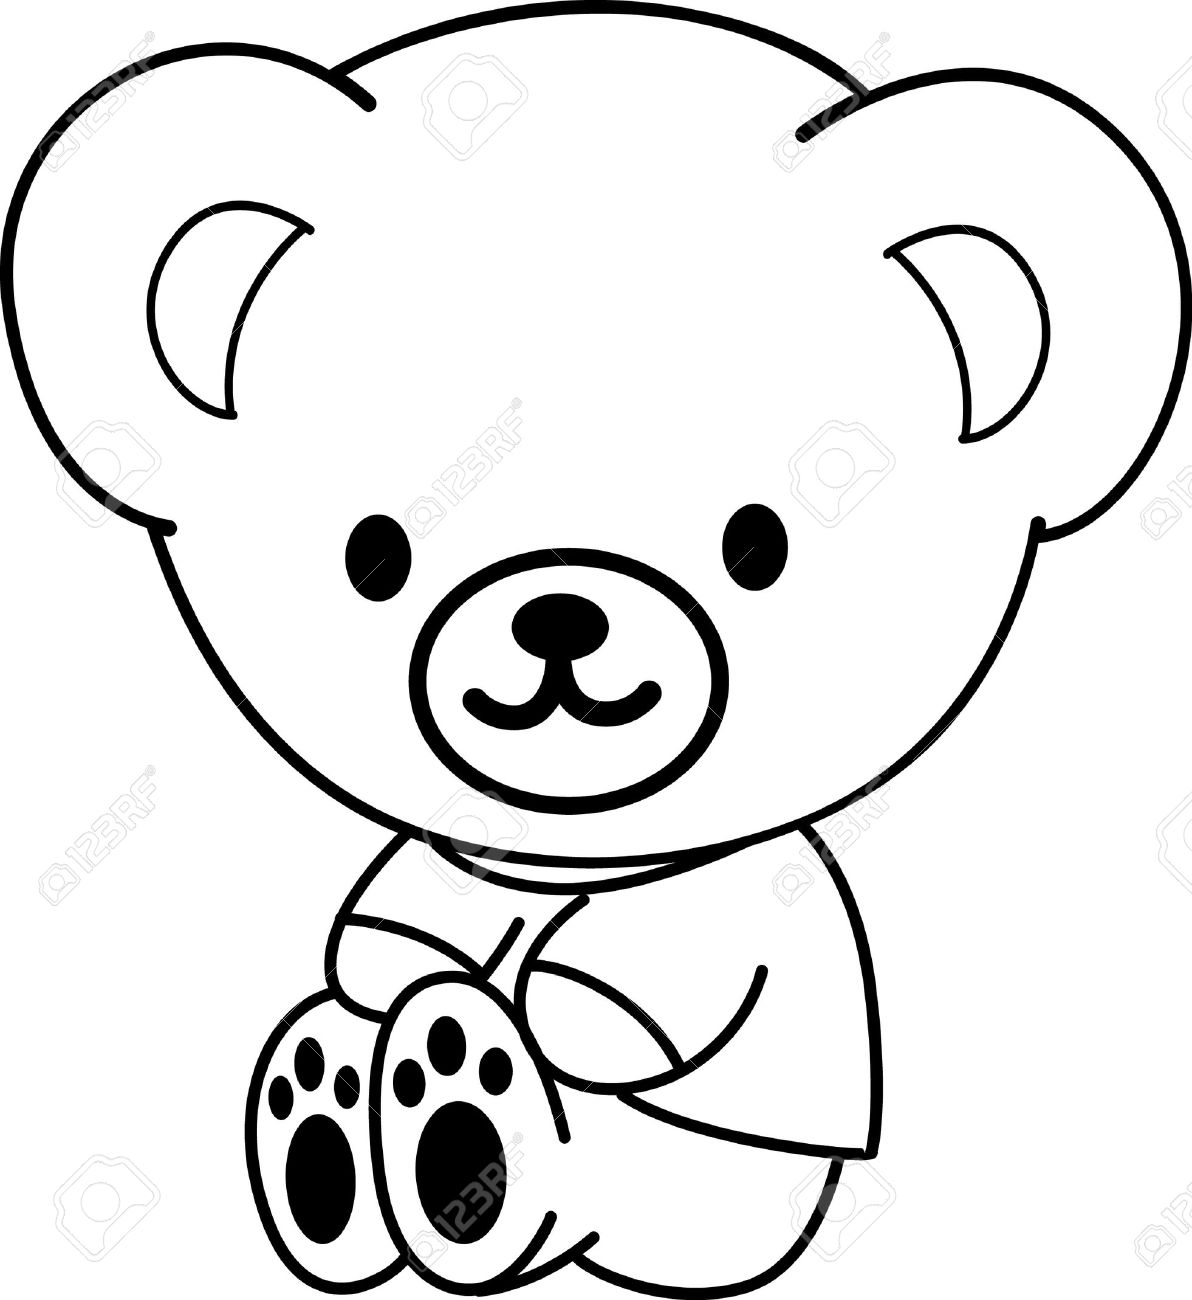 1192x1300 Cartoon Bear Drawing How To Draw A Cartoon Bear